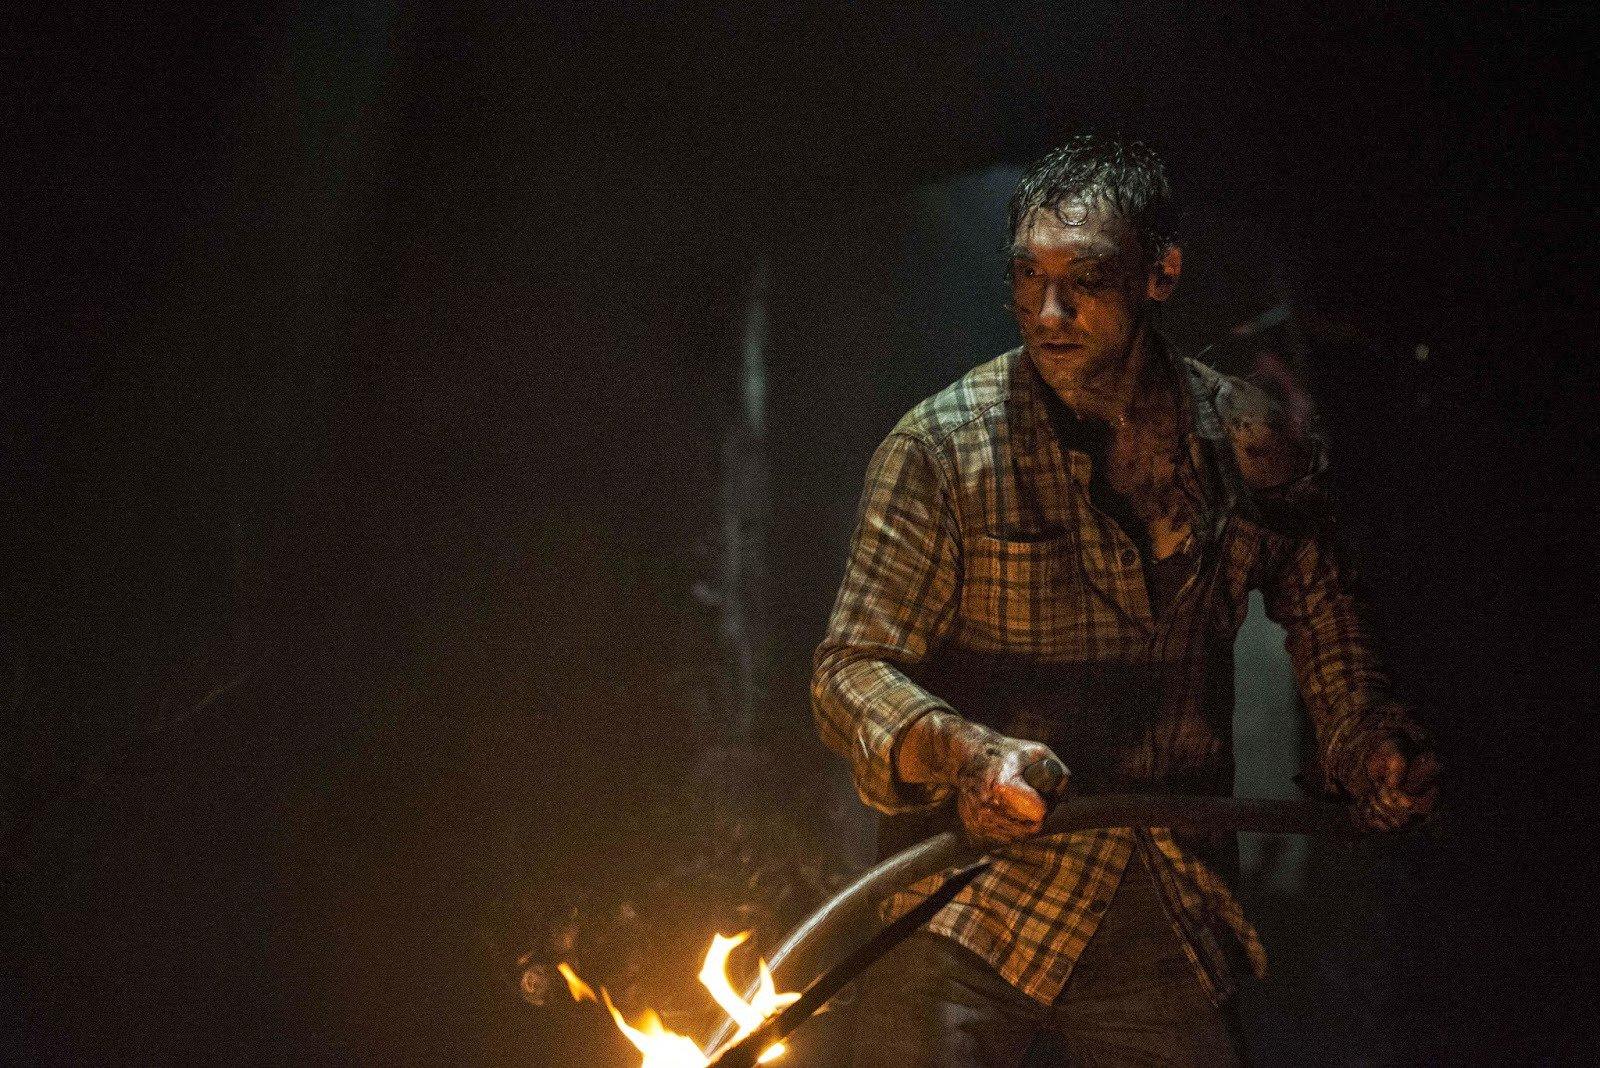 The Hallow 2015 British Horror Film